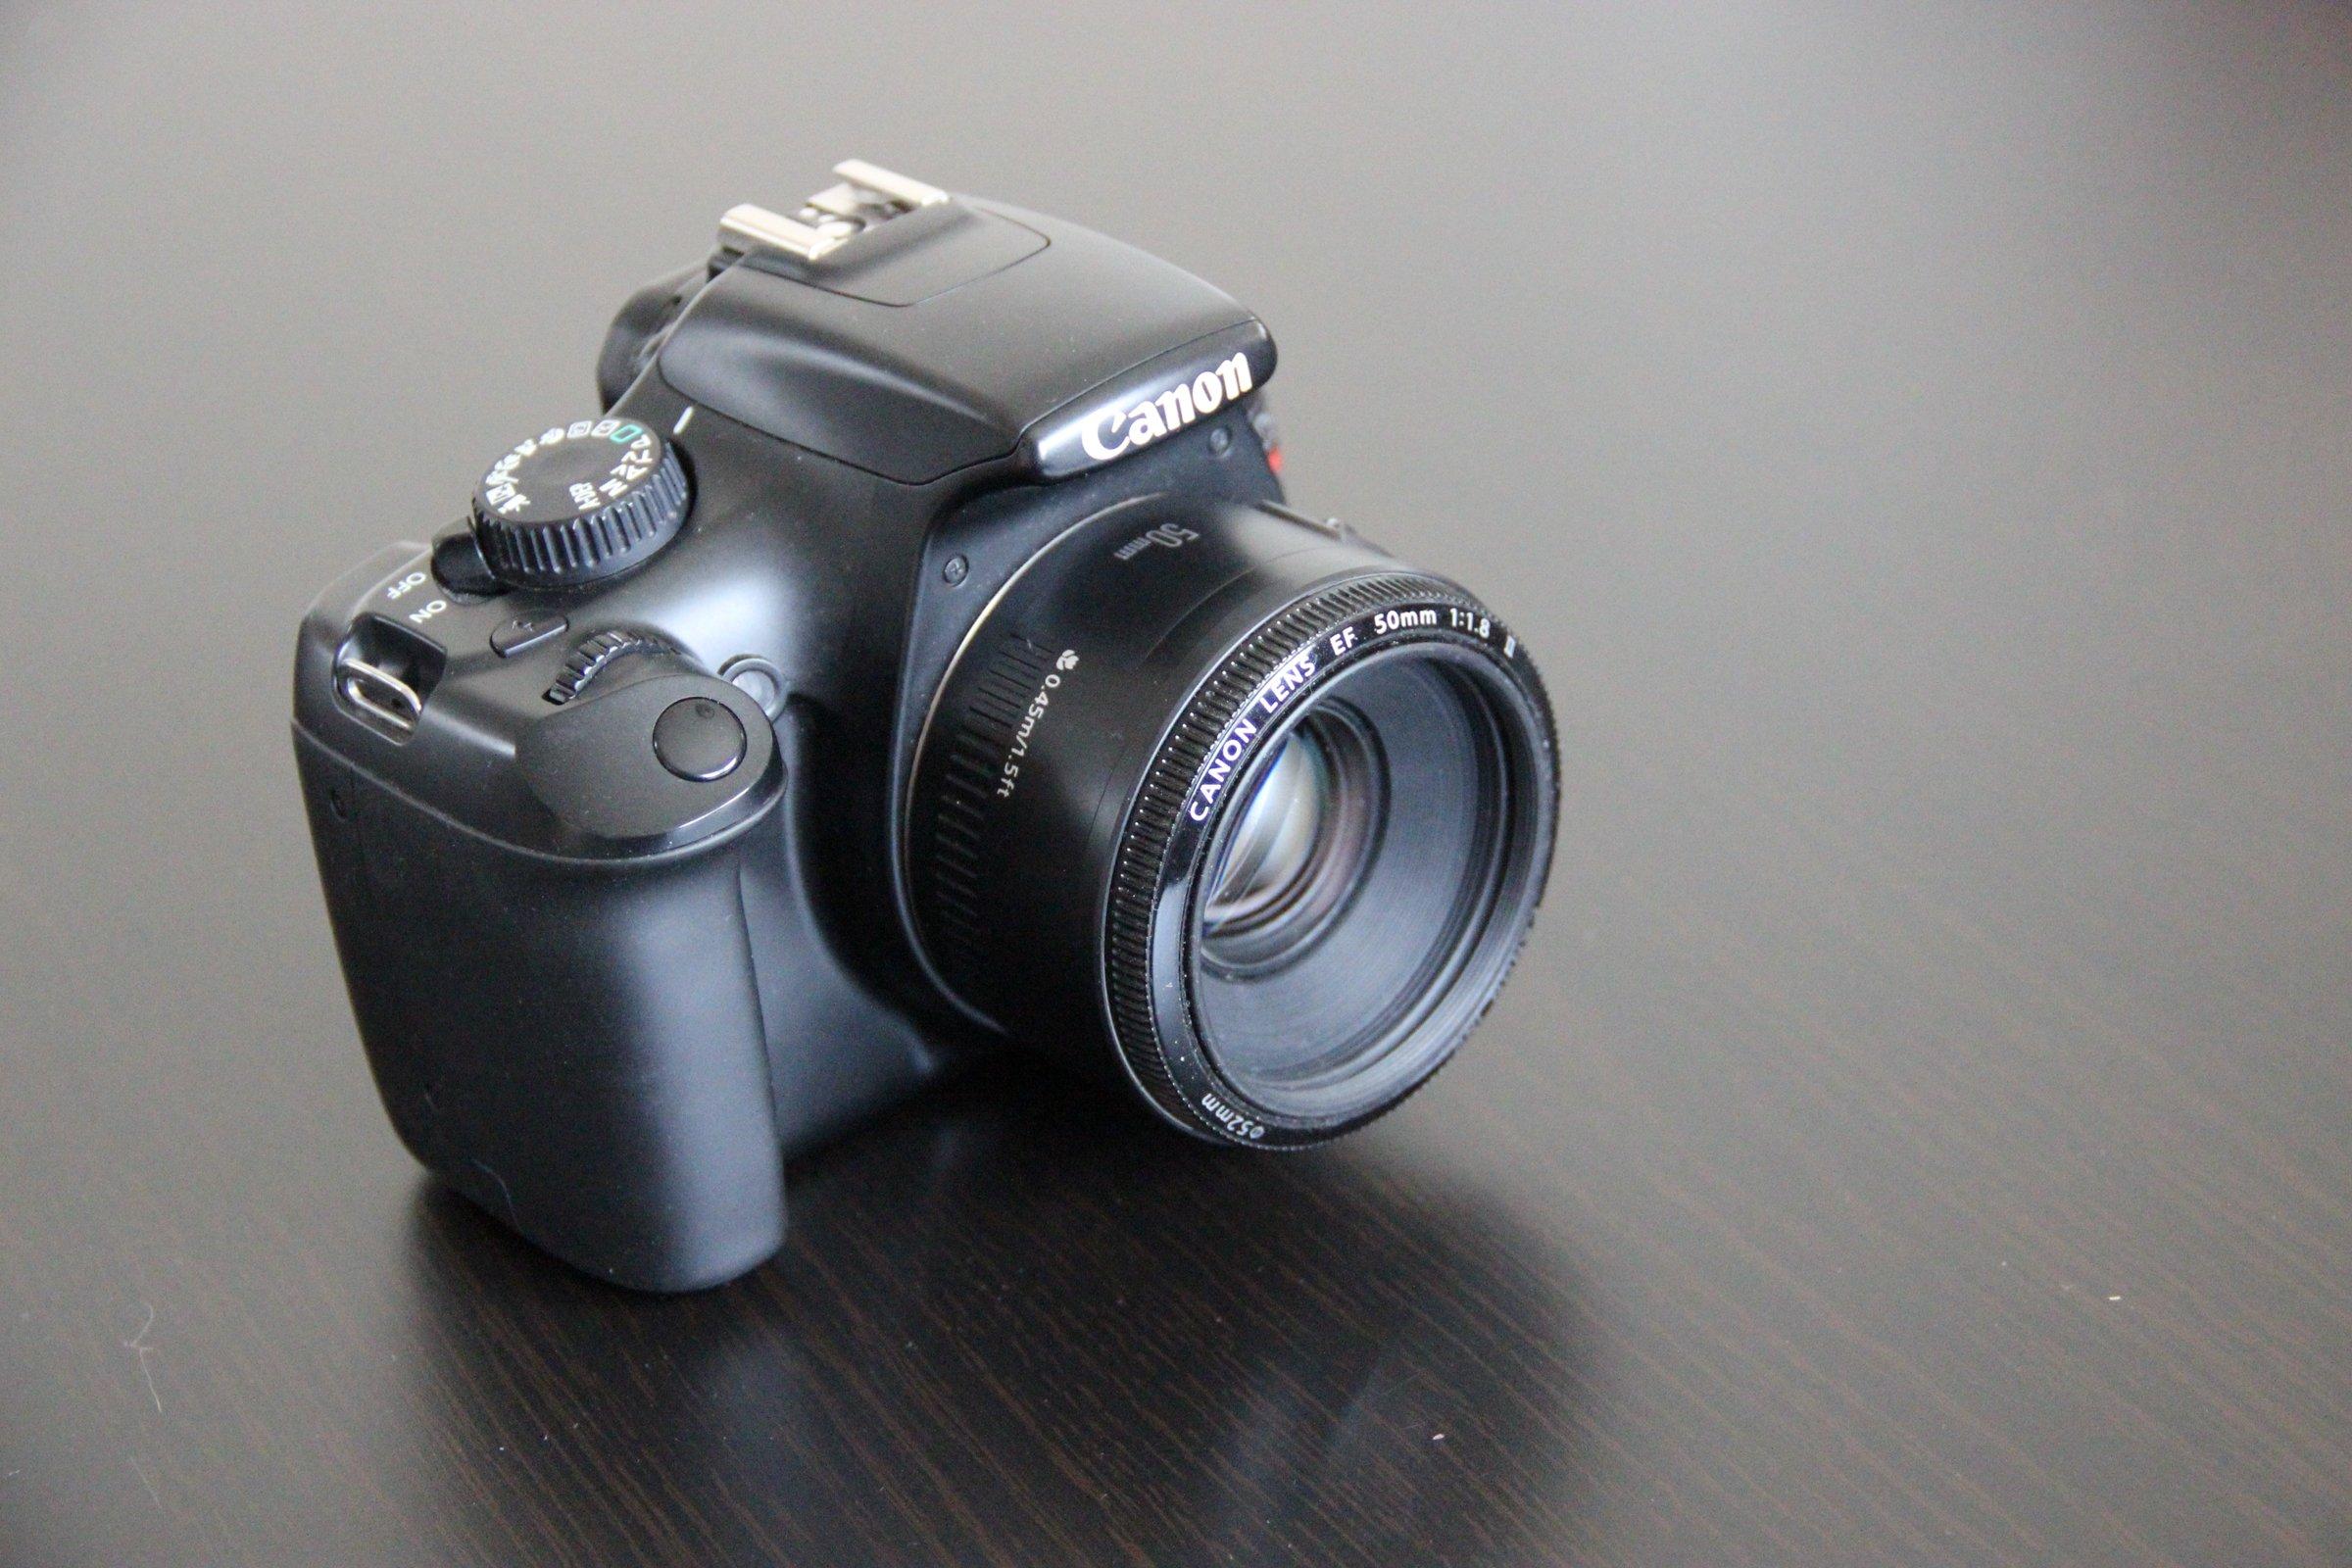 Free Stock Photo of Canon DSLR Camera on Dark Table